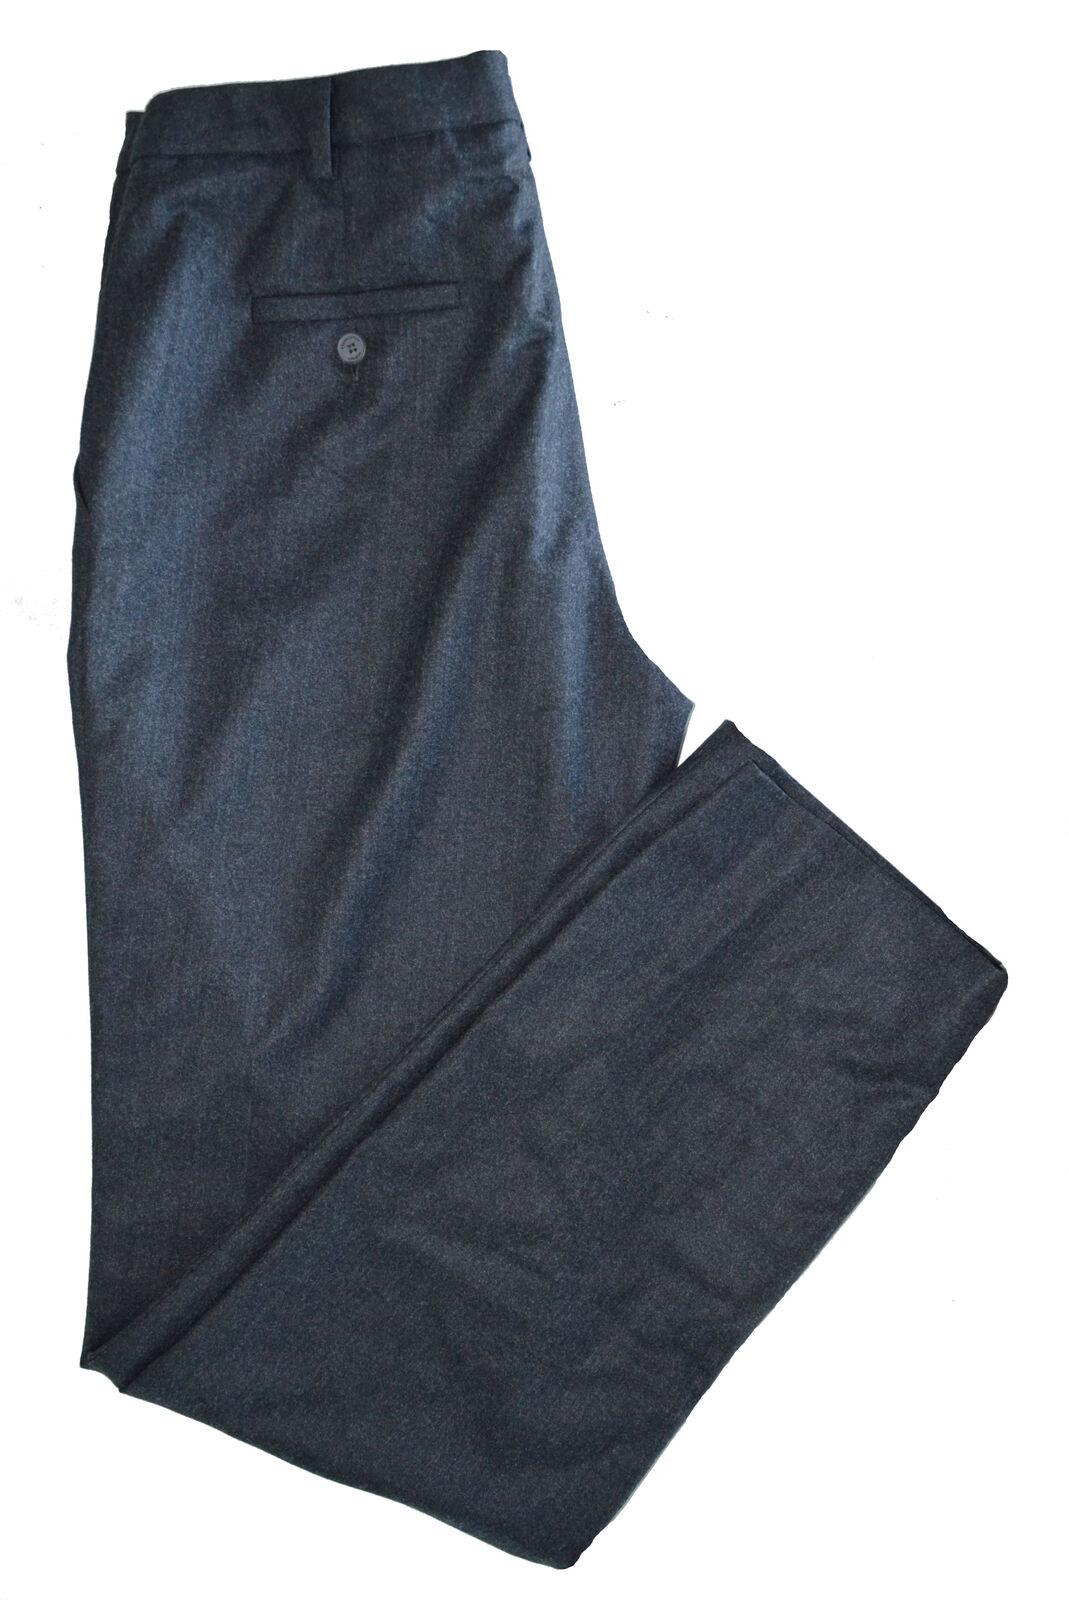 Pantalone women Aquascutum grey Pants Woman Grey Sunton Trousers